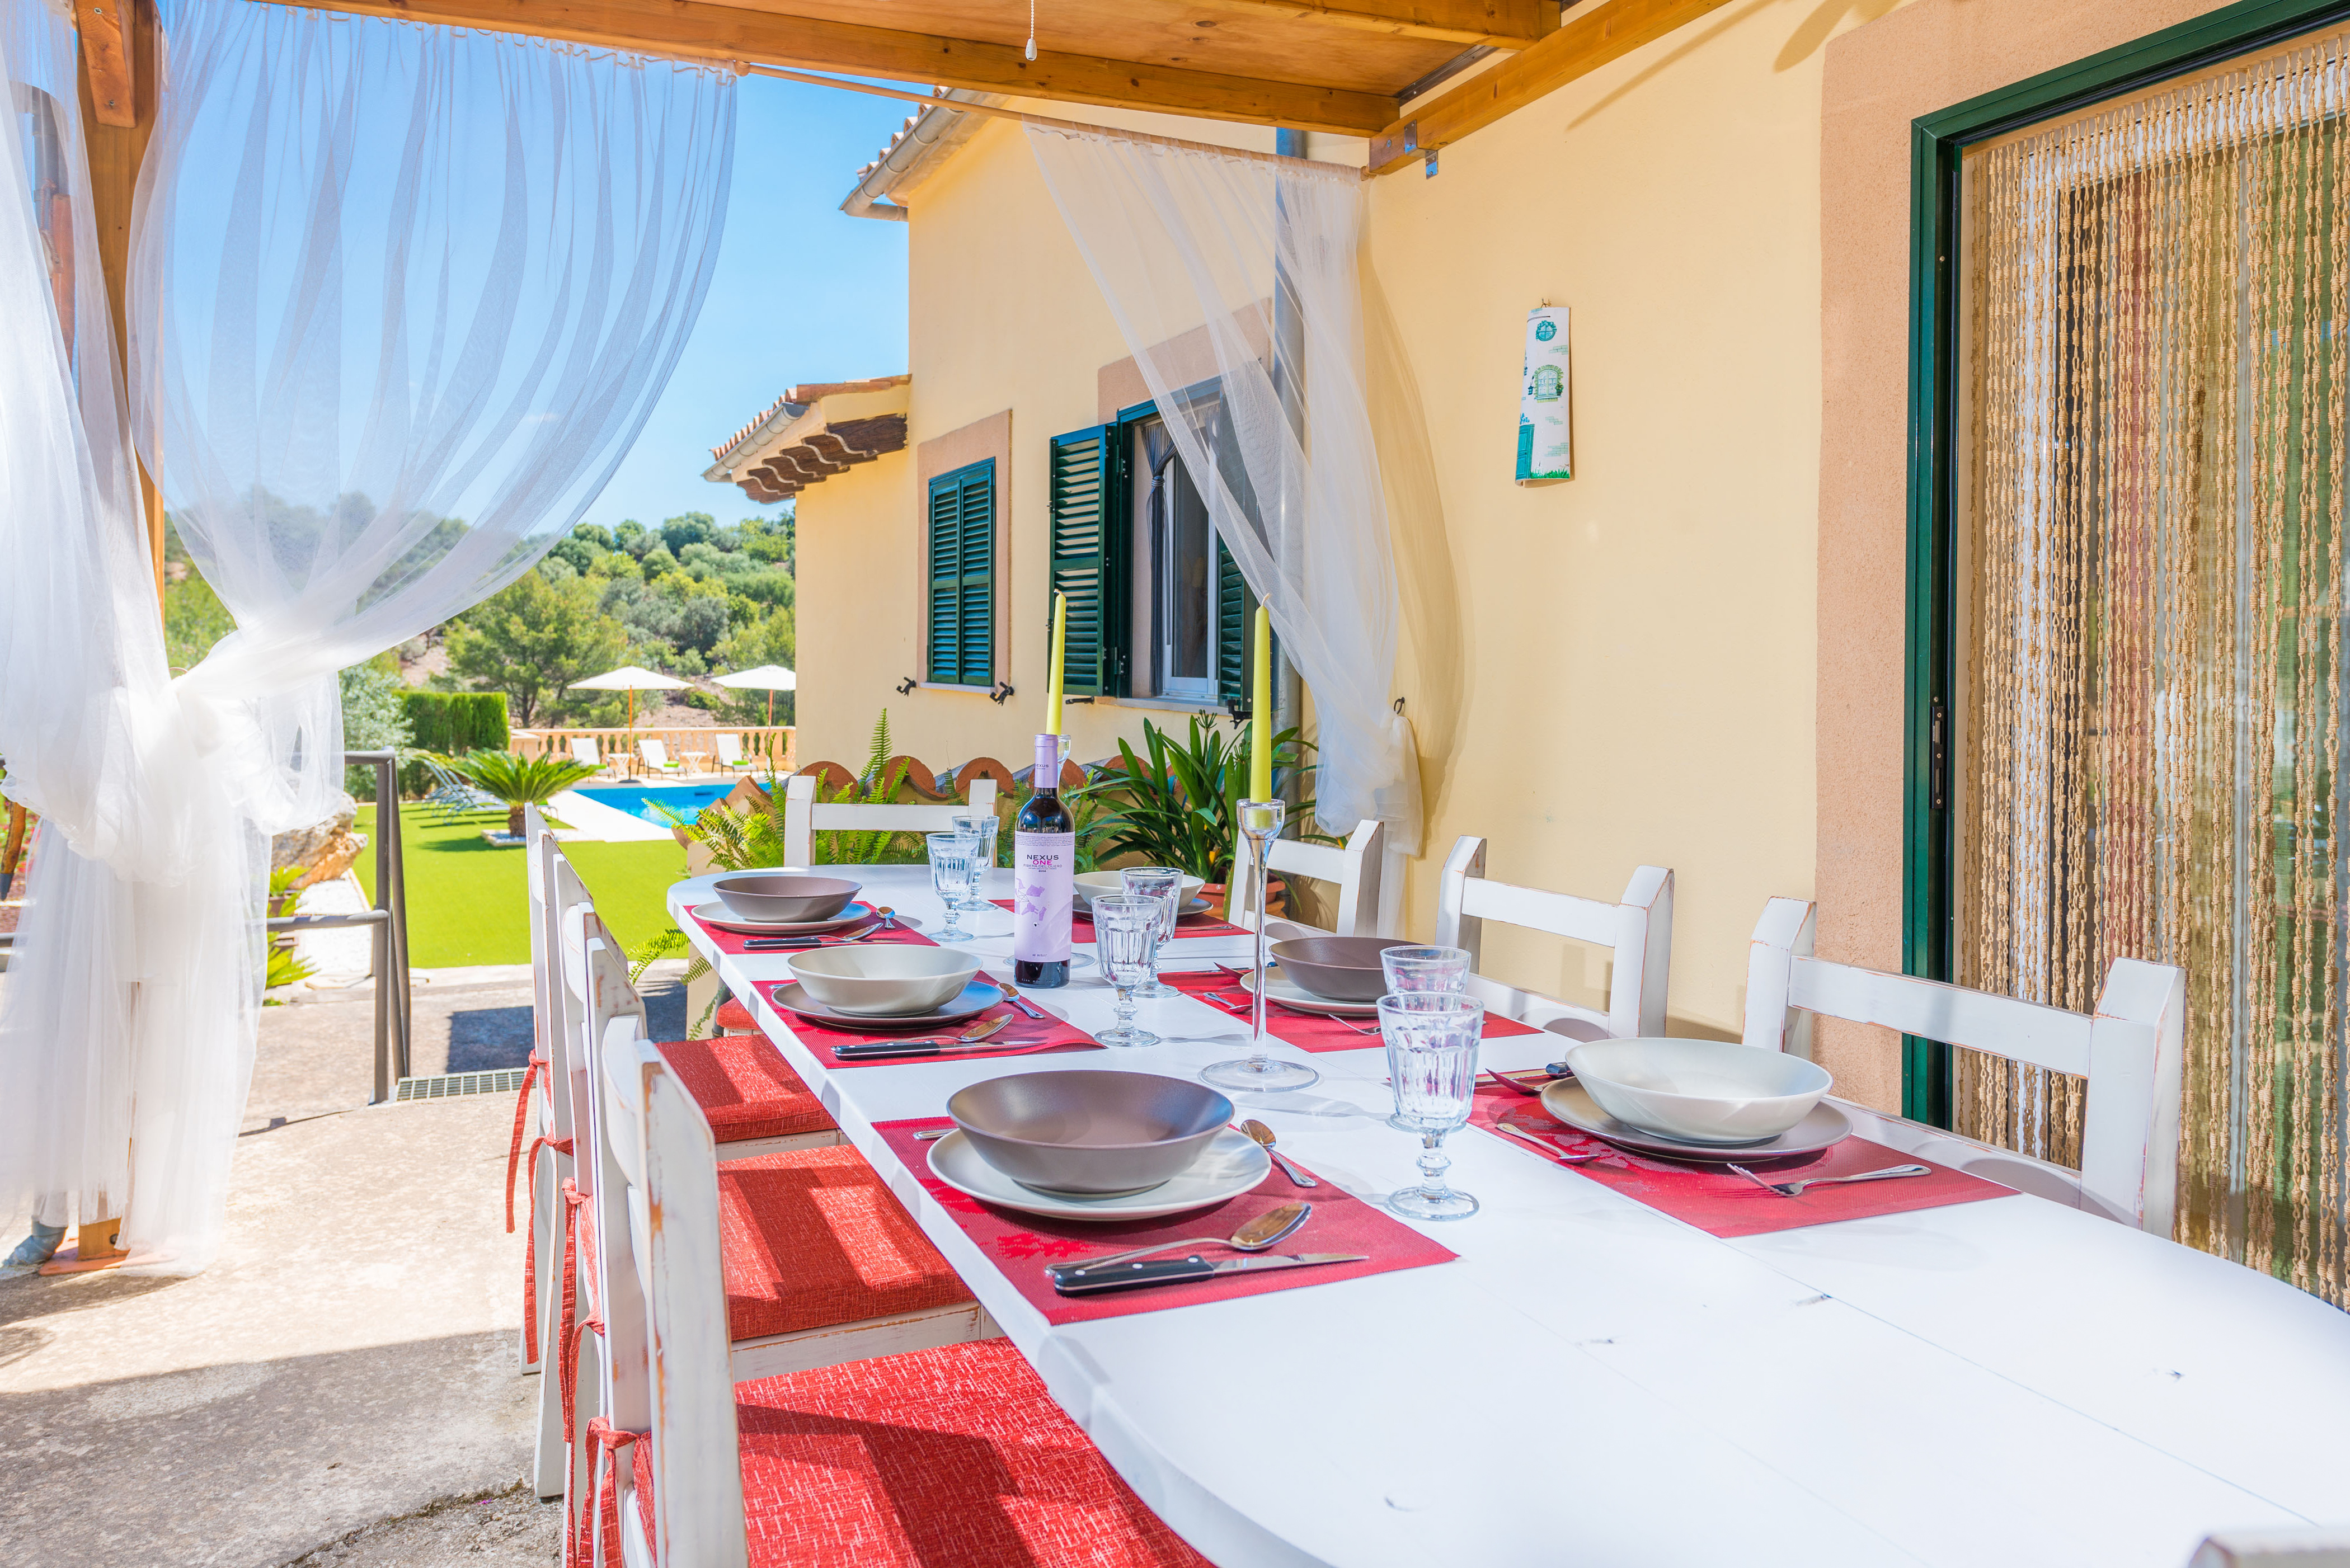 Ferienhaus SA TANCA (MANCORINA) (2037553), Mancor de la Vall, Mallorca, Balearische Inseln, Spanien, Bild 10